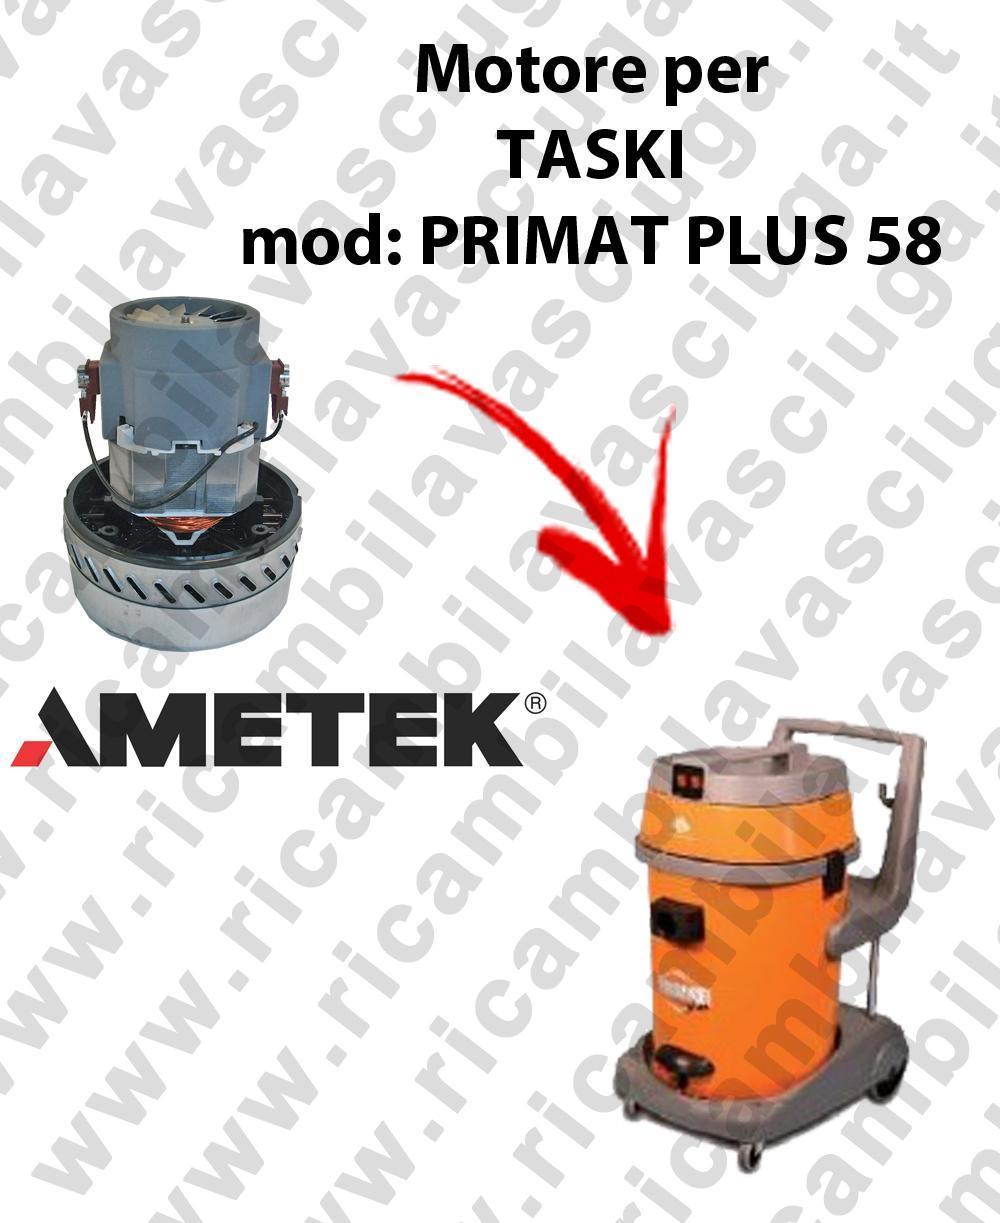 PRIMAT PLUS 58 AMETEK vacuum motor for wet and dry vacuum cleaner TASKI